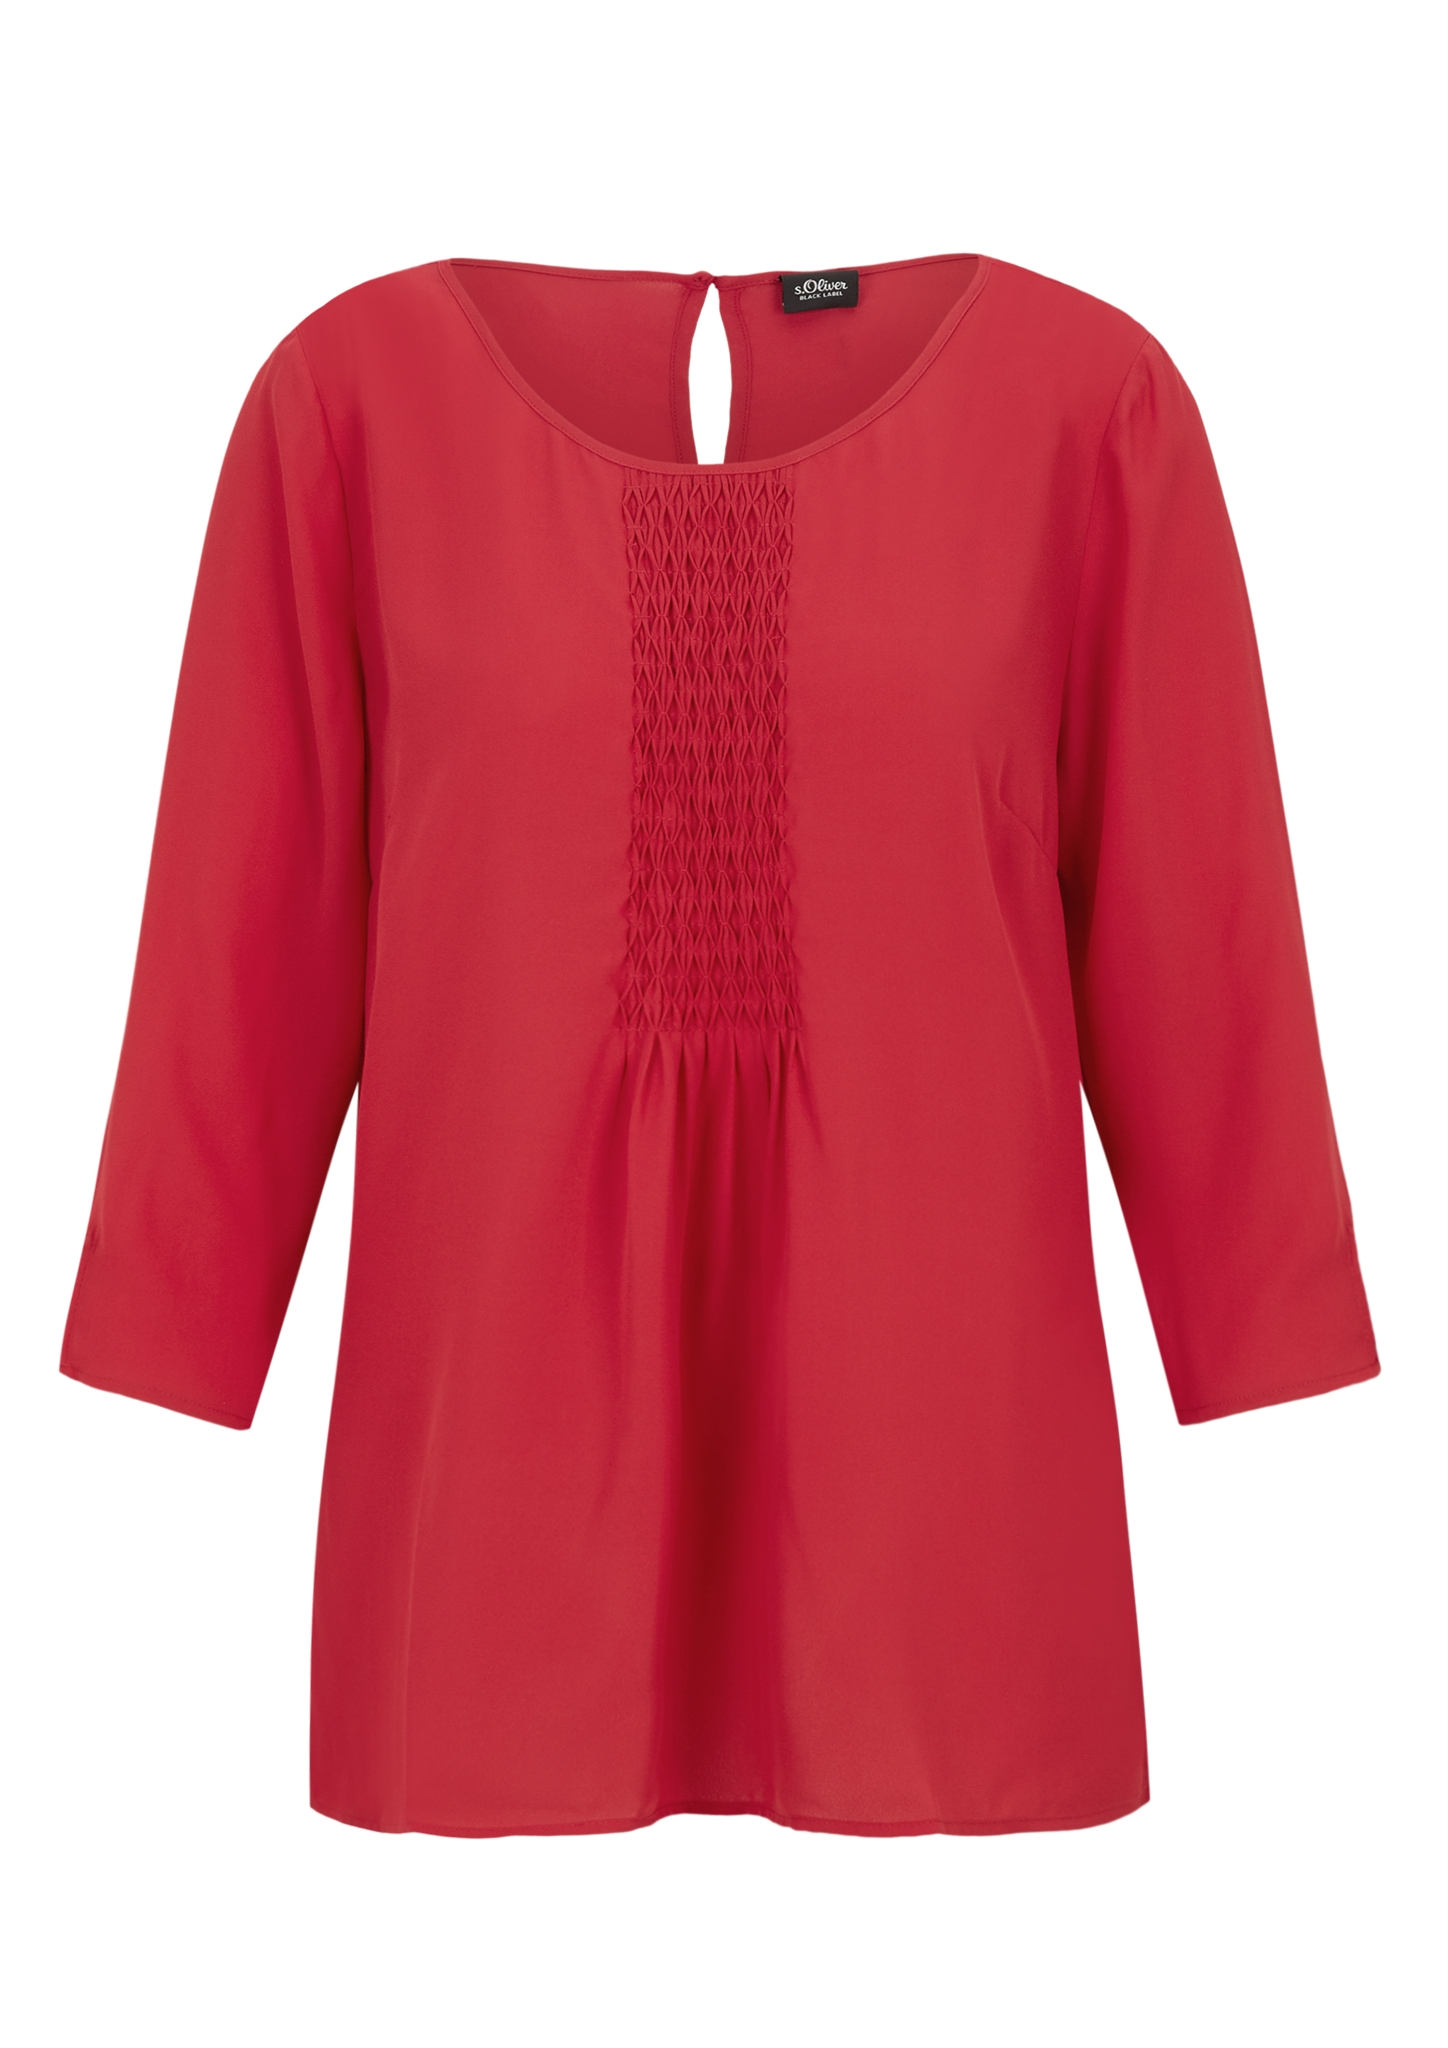 Chiffonbluse | Bekleidung > Blusen > Chiffonblusen | Rot | 100% polyester | s.Oliver BLACK LABEL